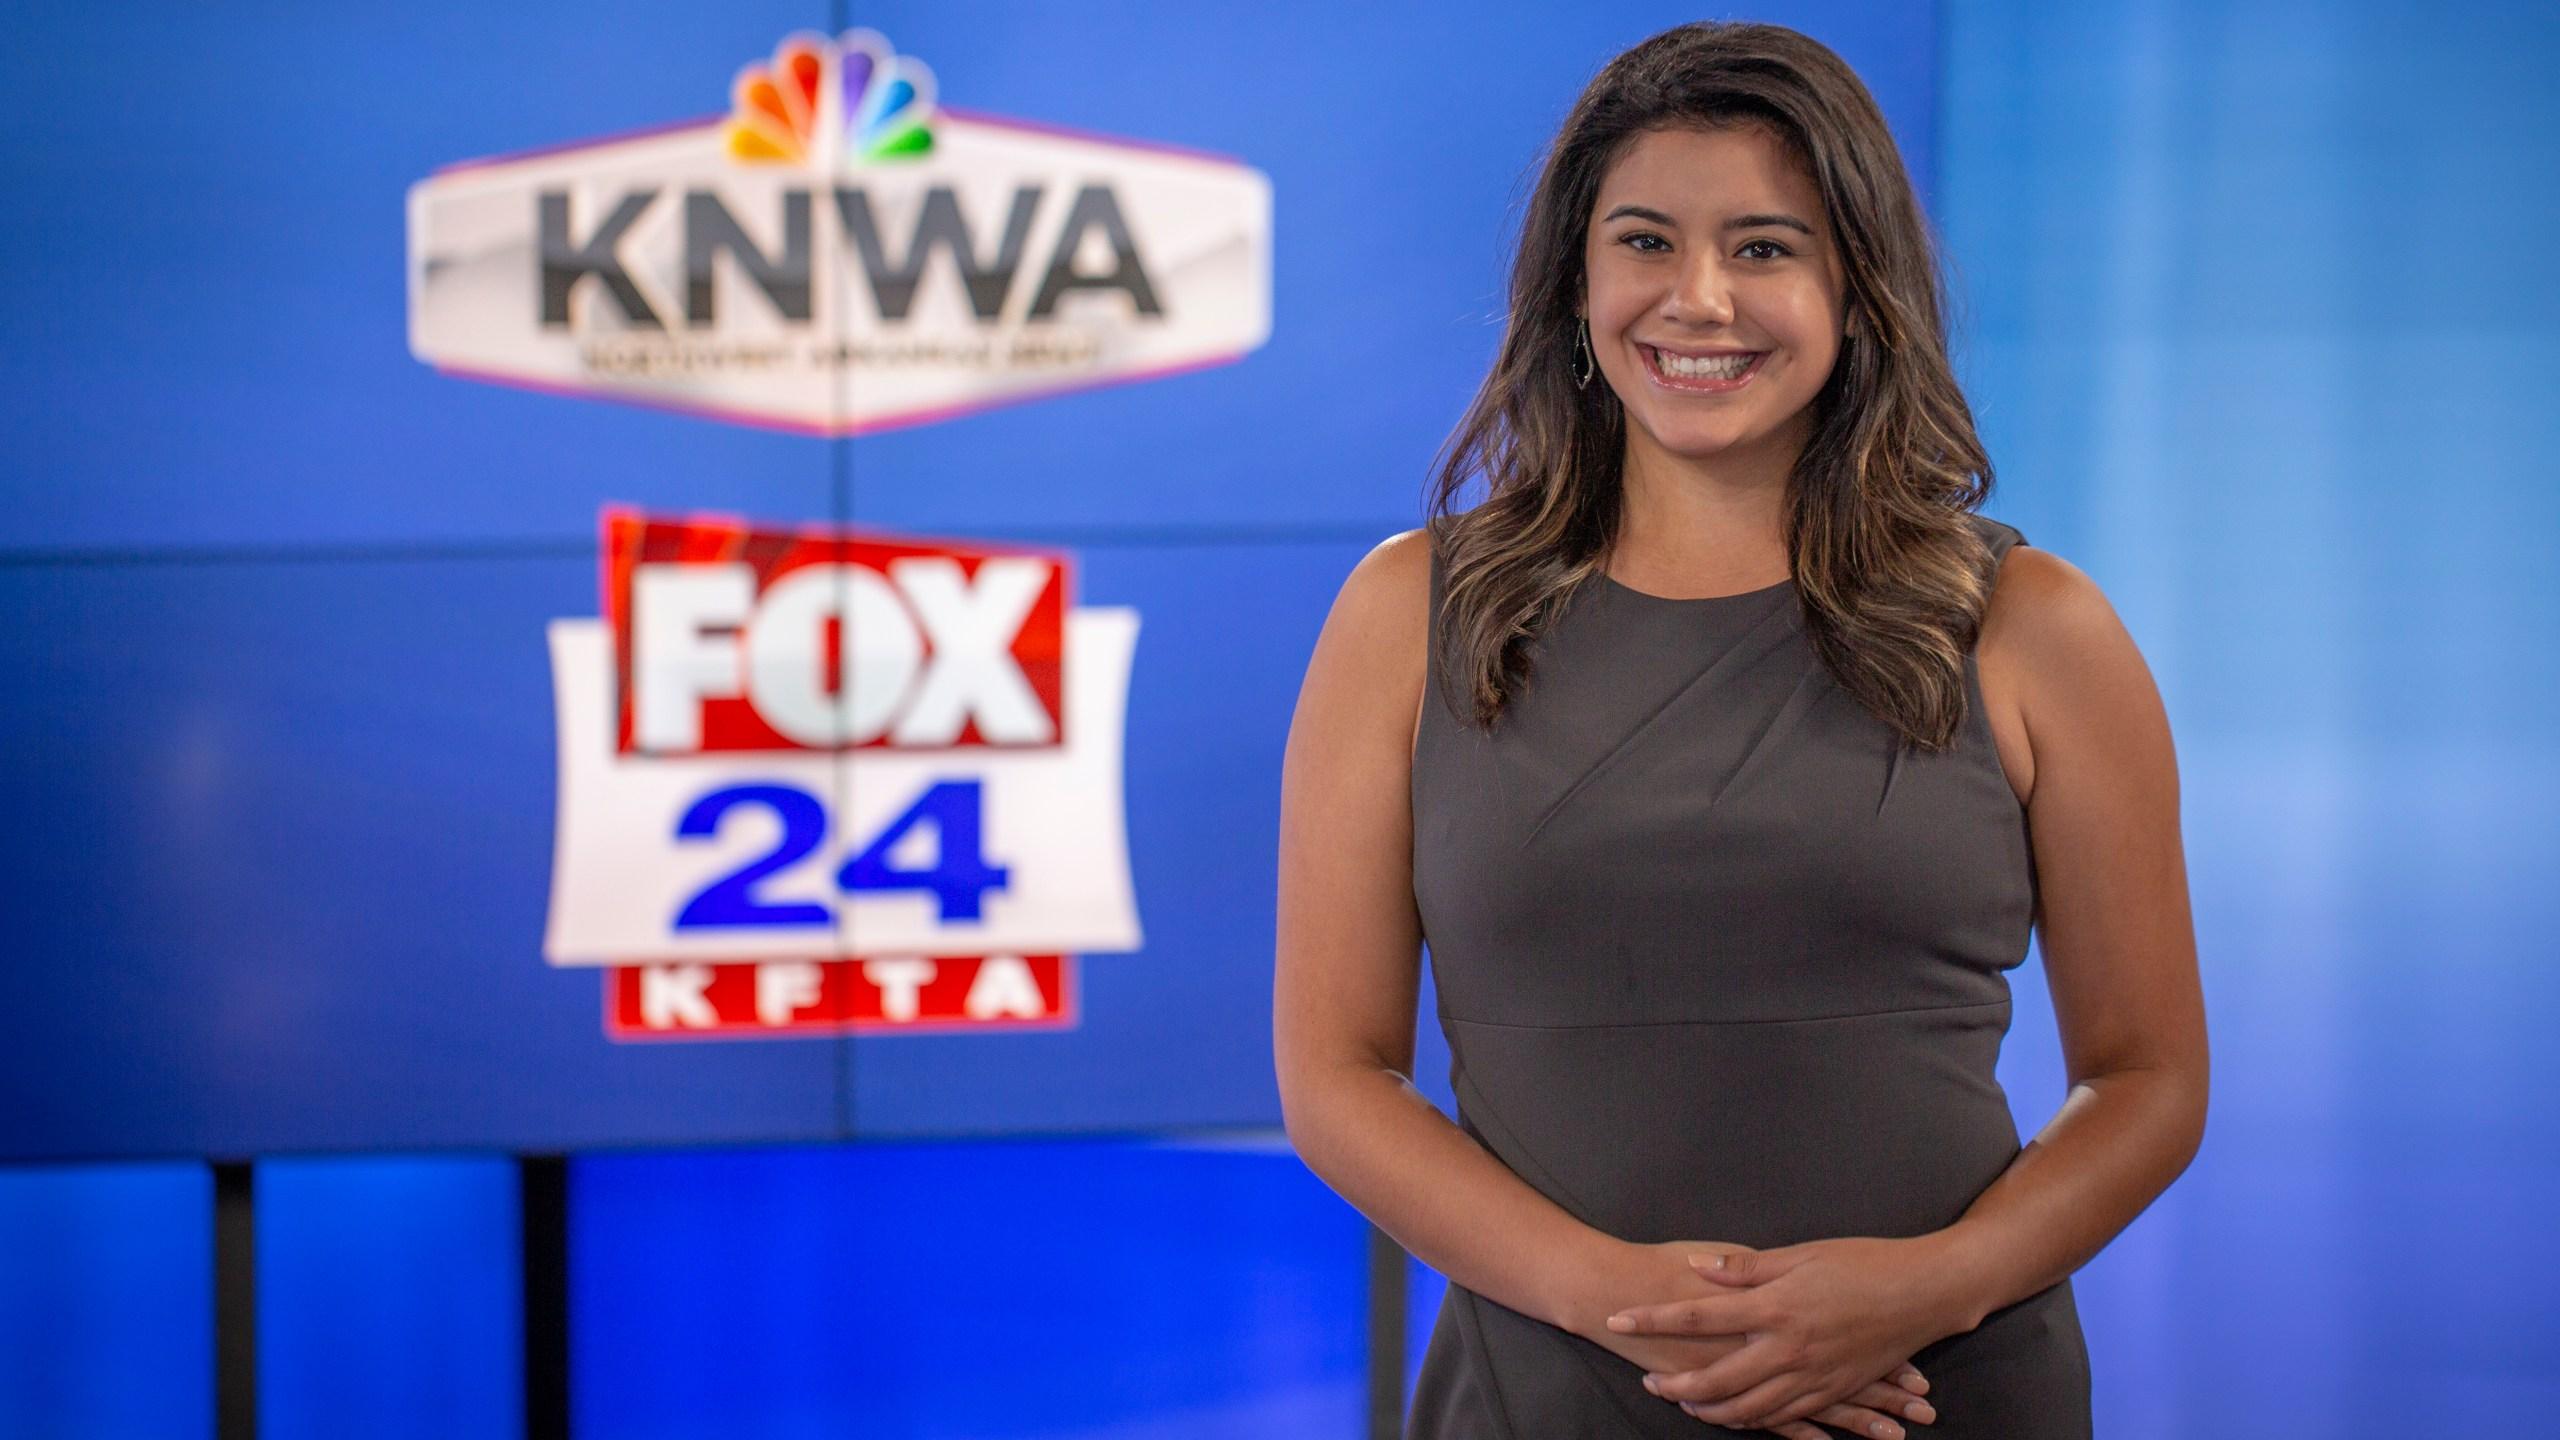 Meet the KNWA and FOX24 Team